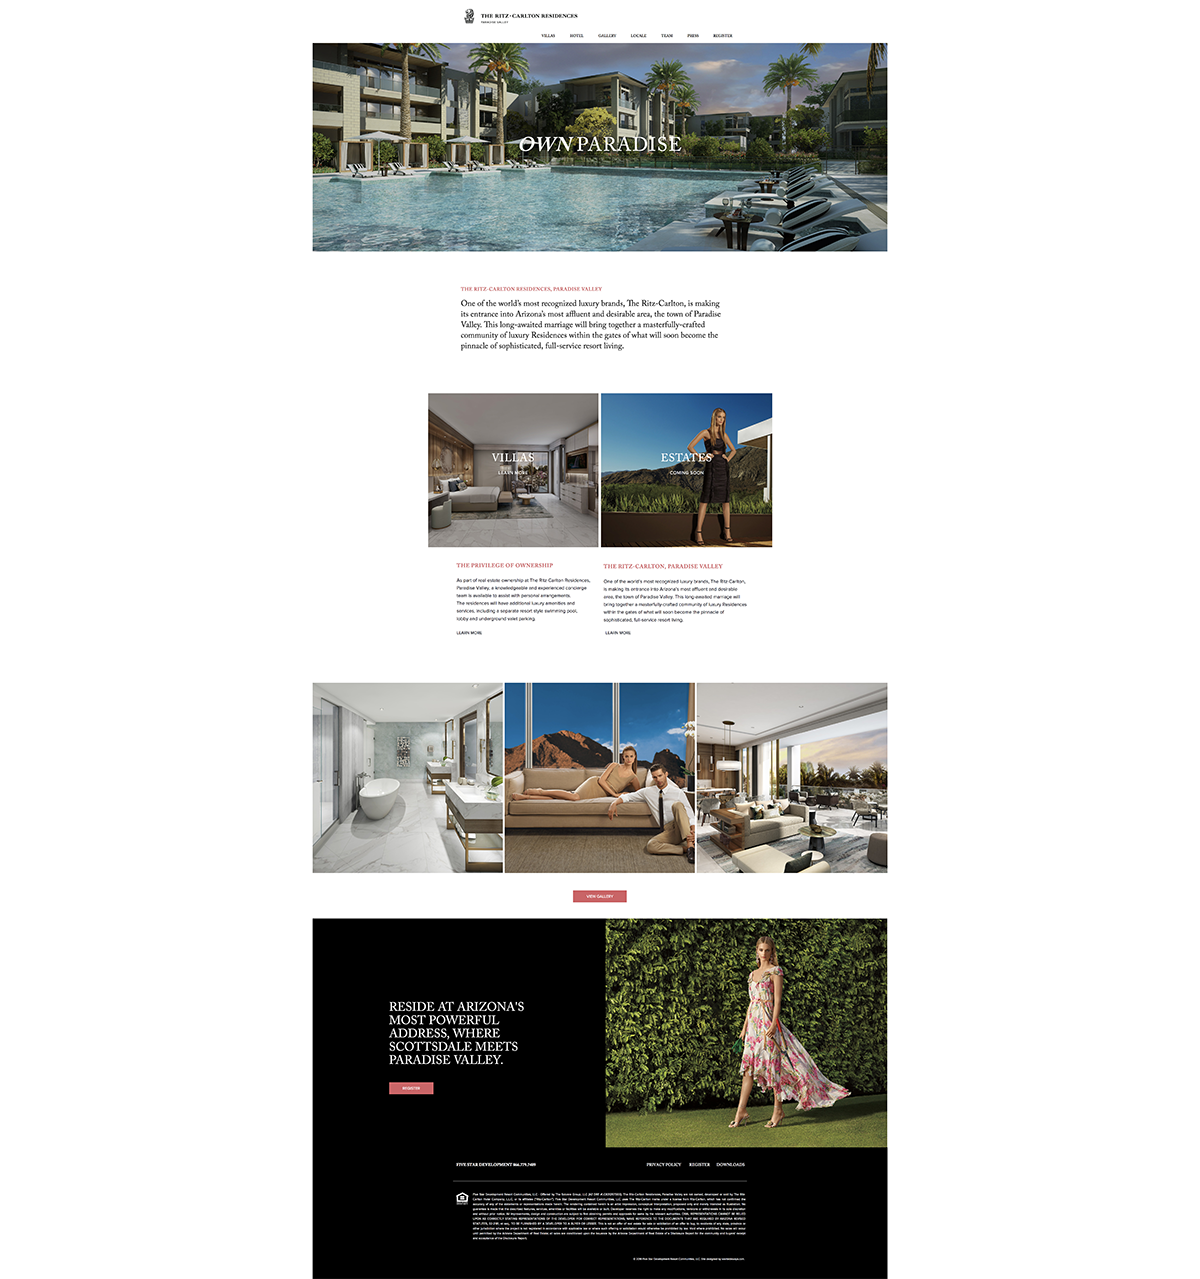 Phoenix Marketing Agency | Ritz-Carlton Paradise Valley